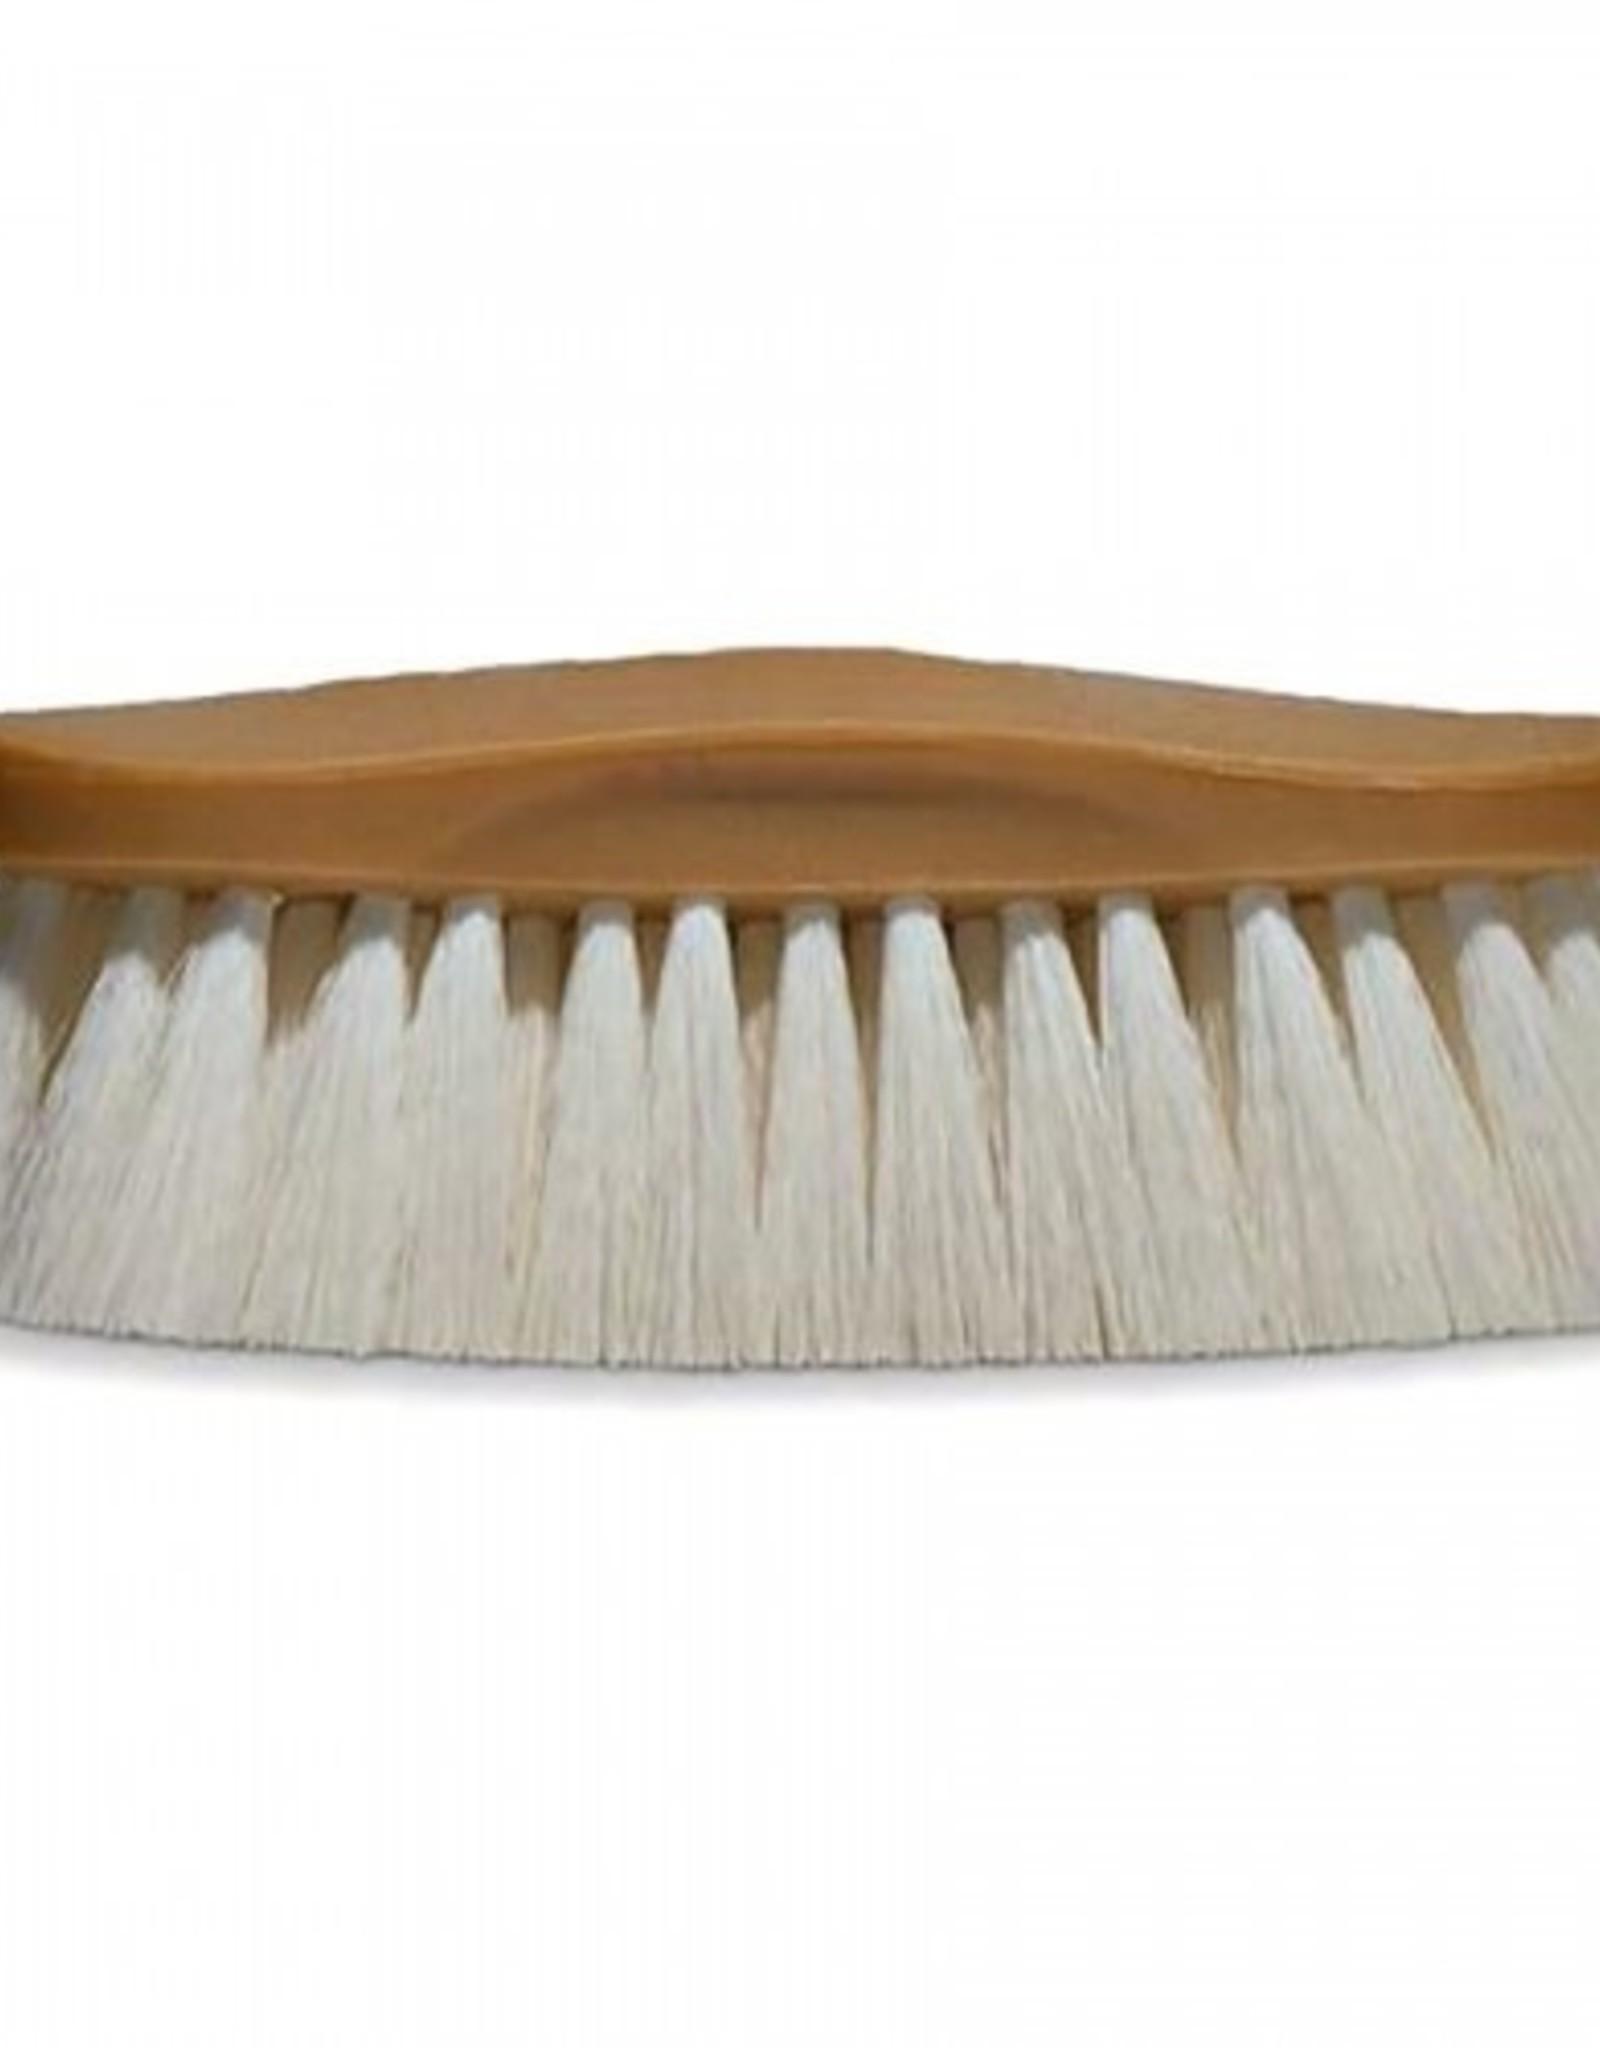 Decker Decker #70 Cherokee Grooming Brush